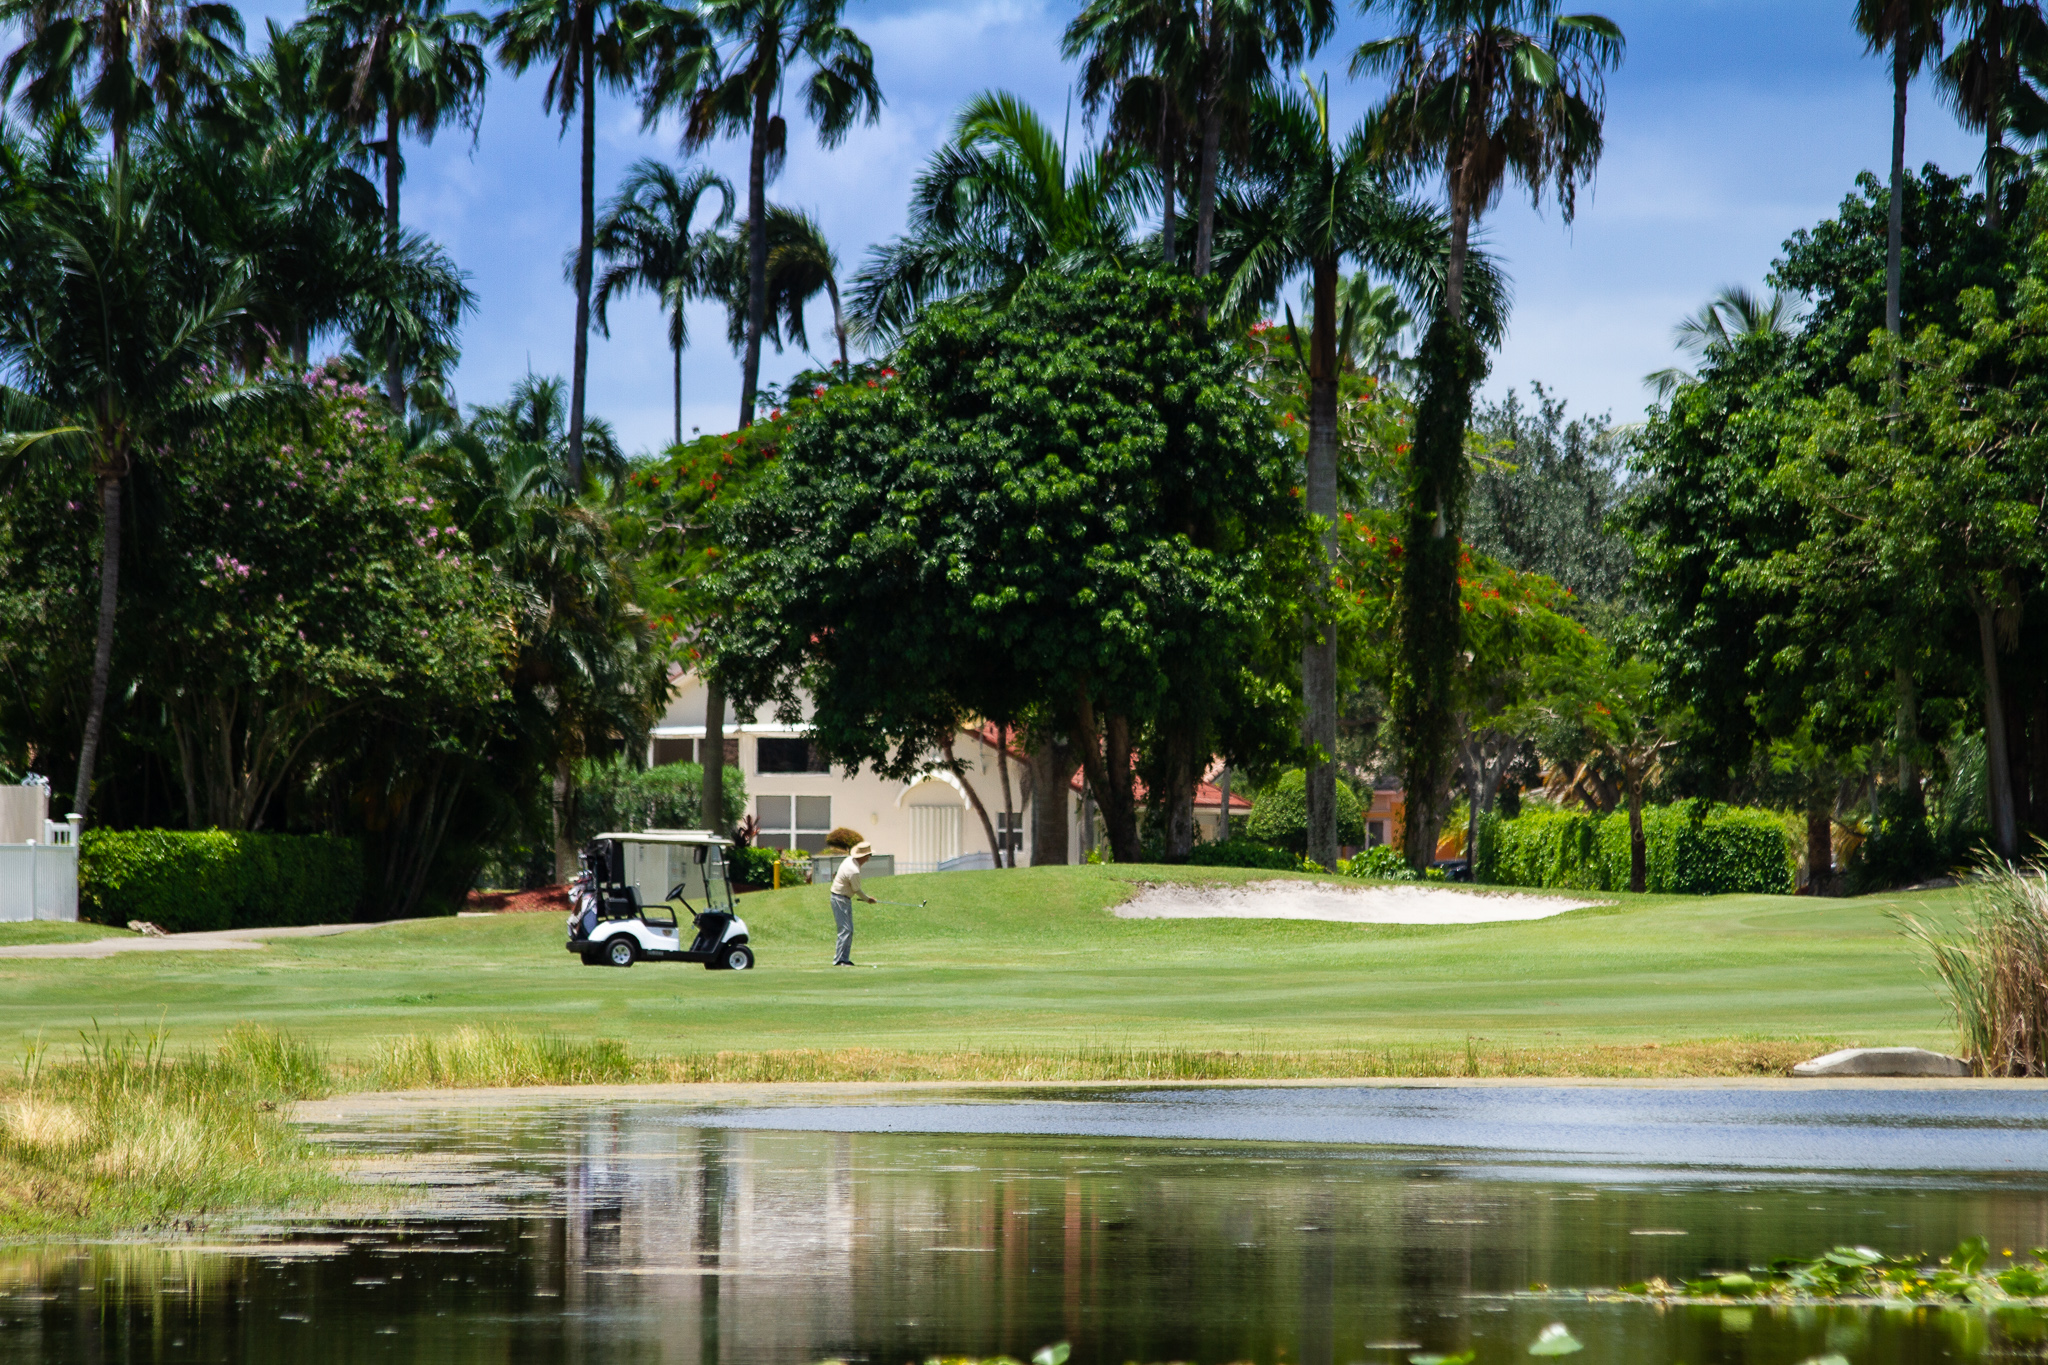 Grand Palms Golf Course